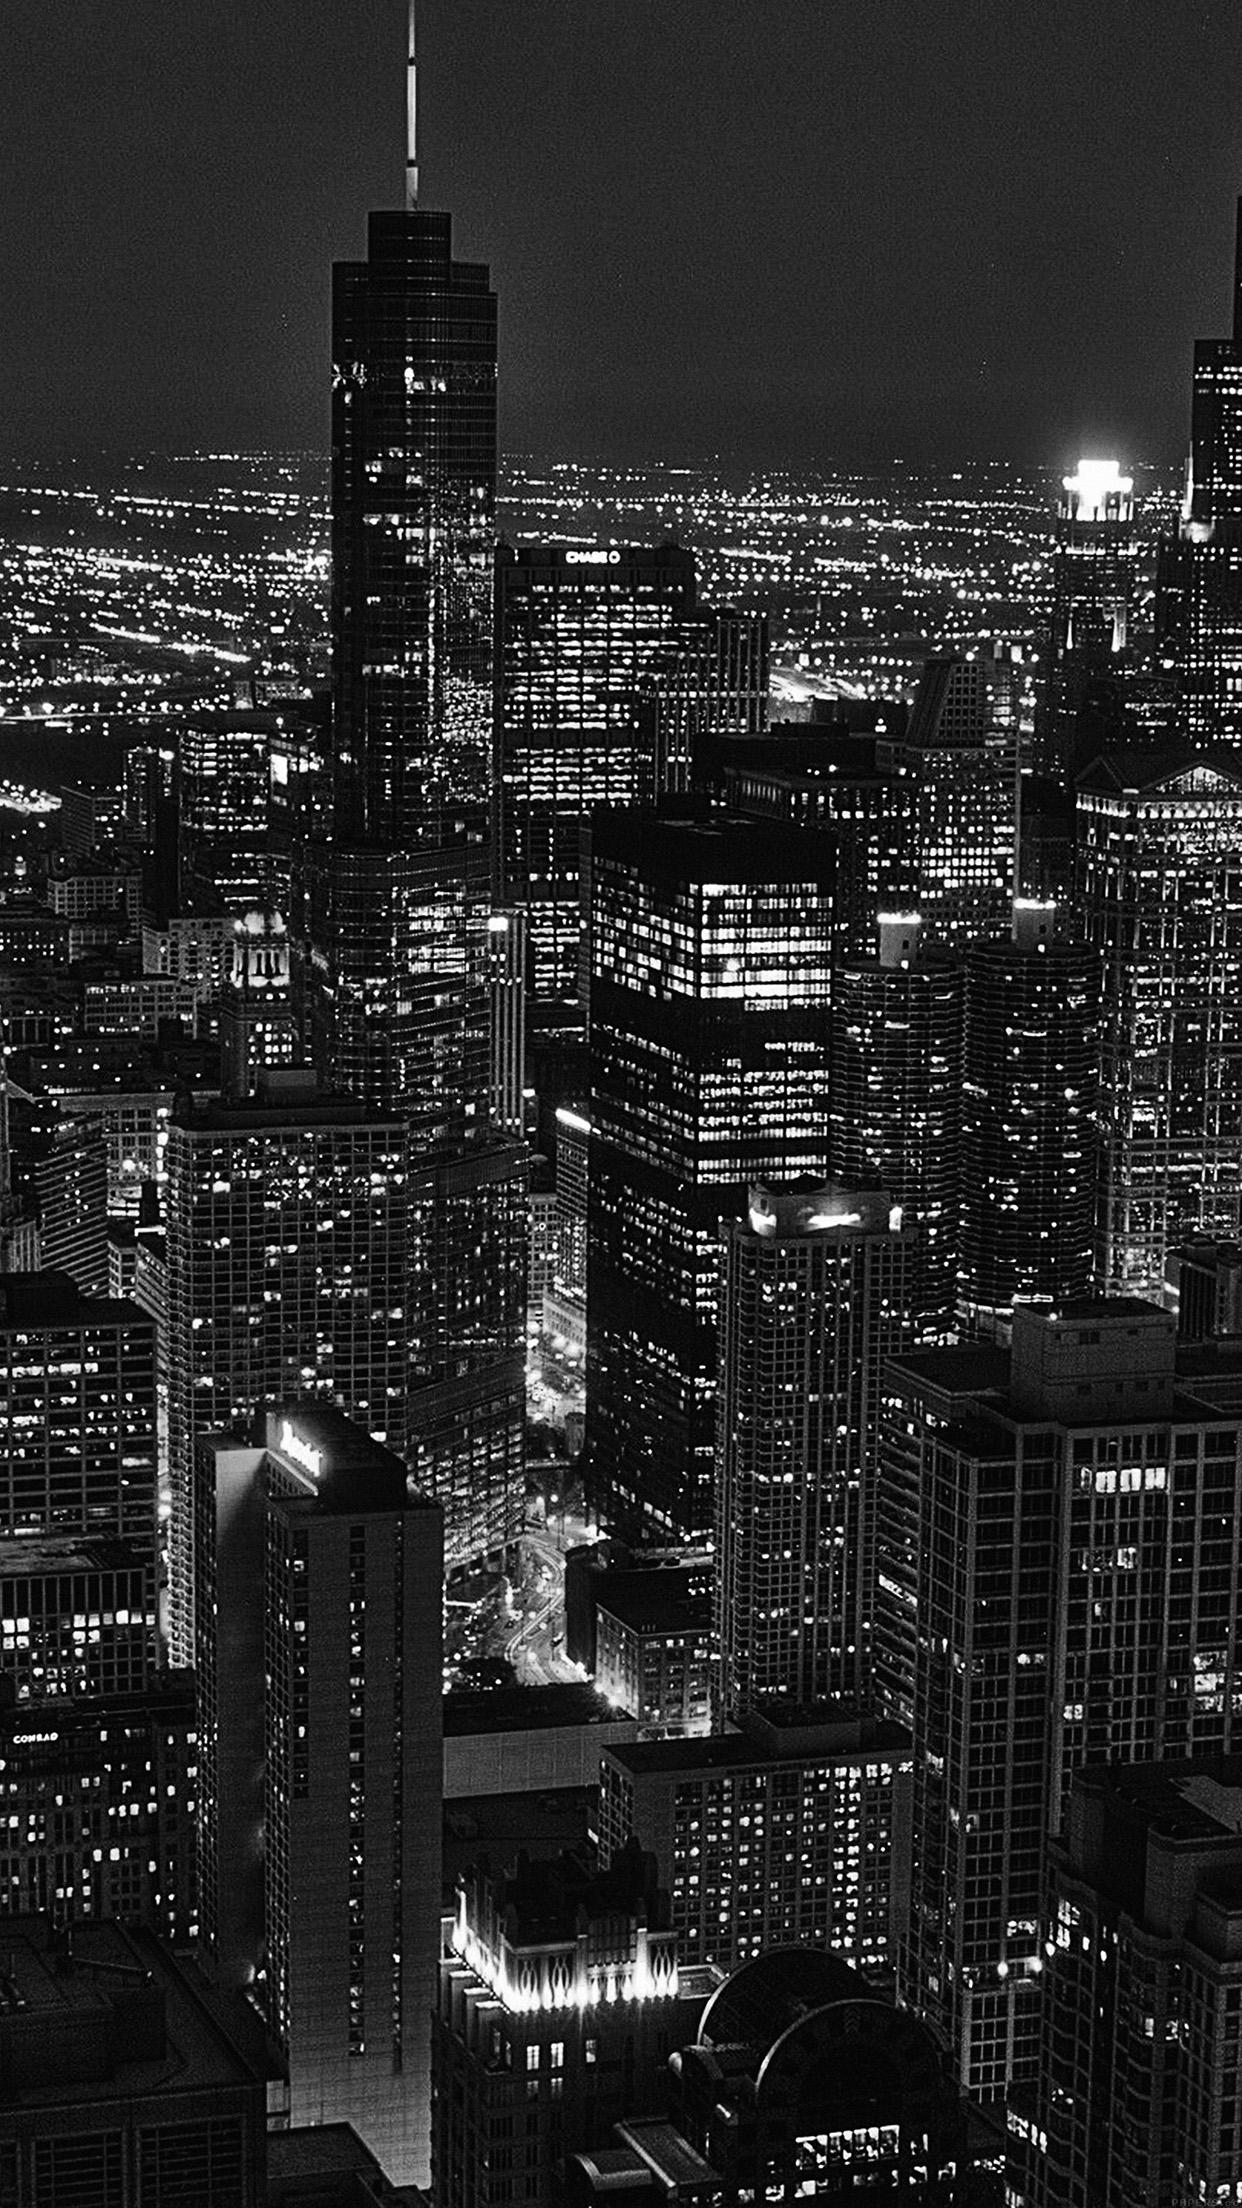 Iphone X Blueprint Wallpaper Ml84 City View Night Dark Bw Wallpaper